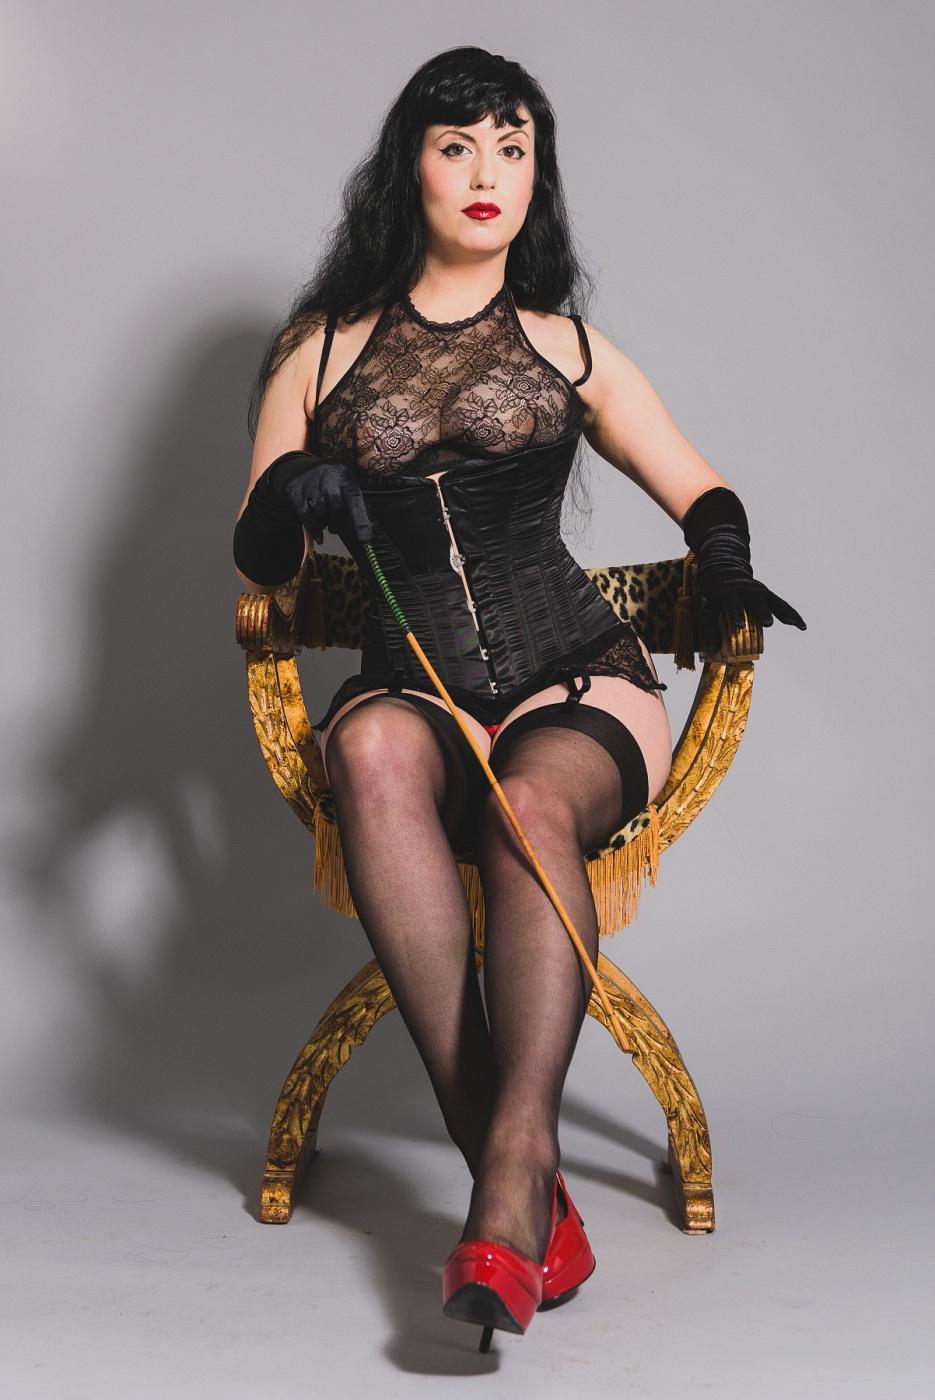 Ms. Veronica Bastille